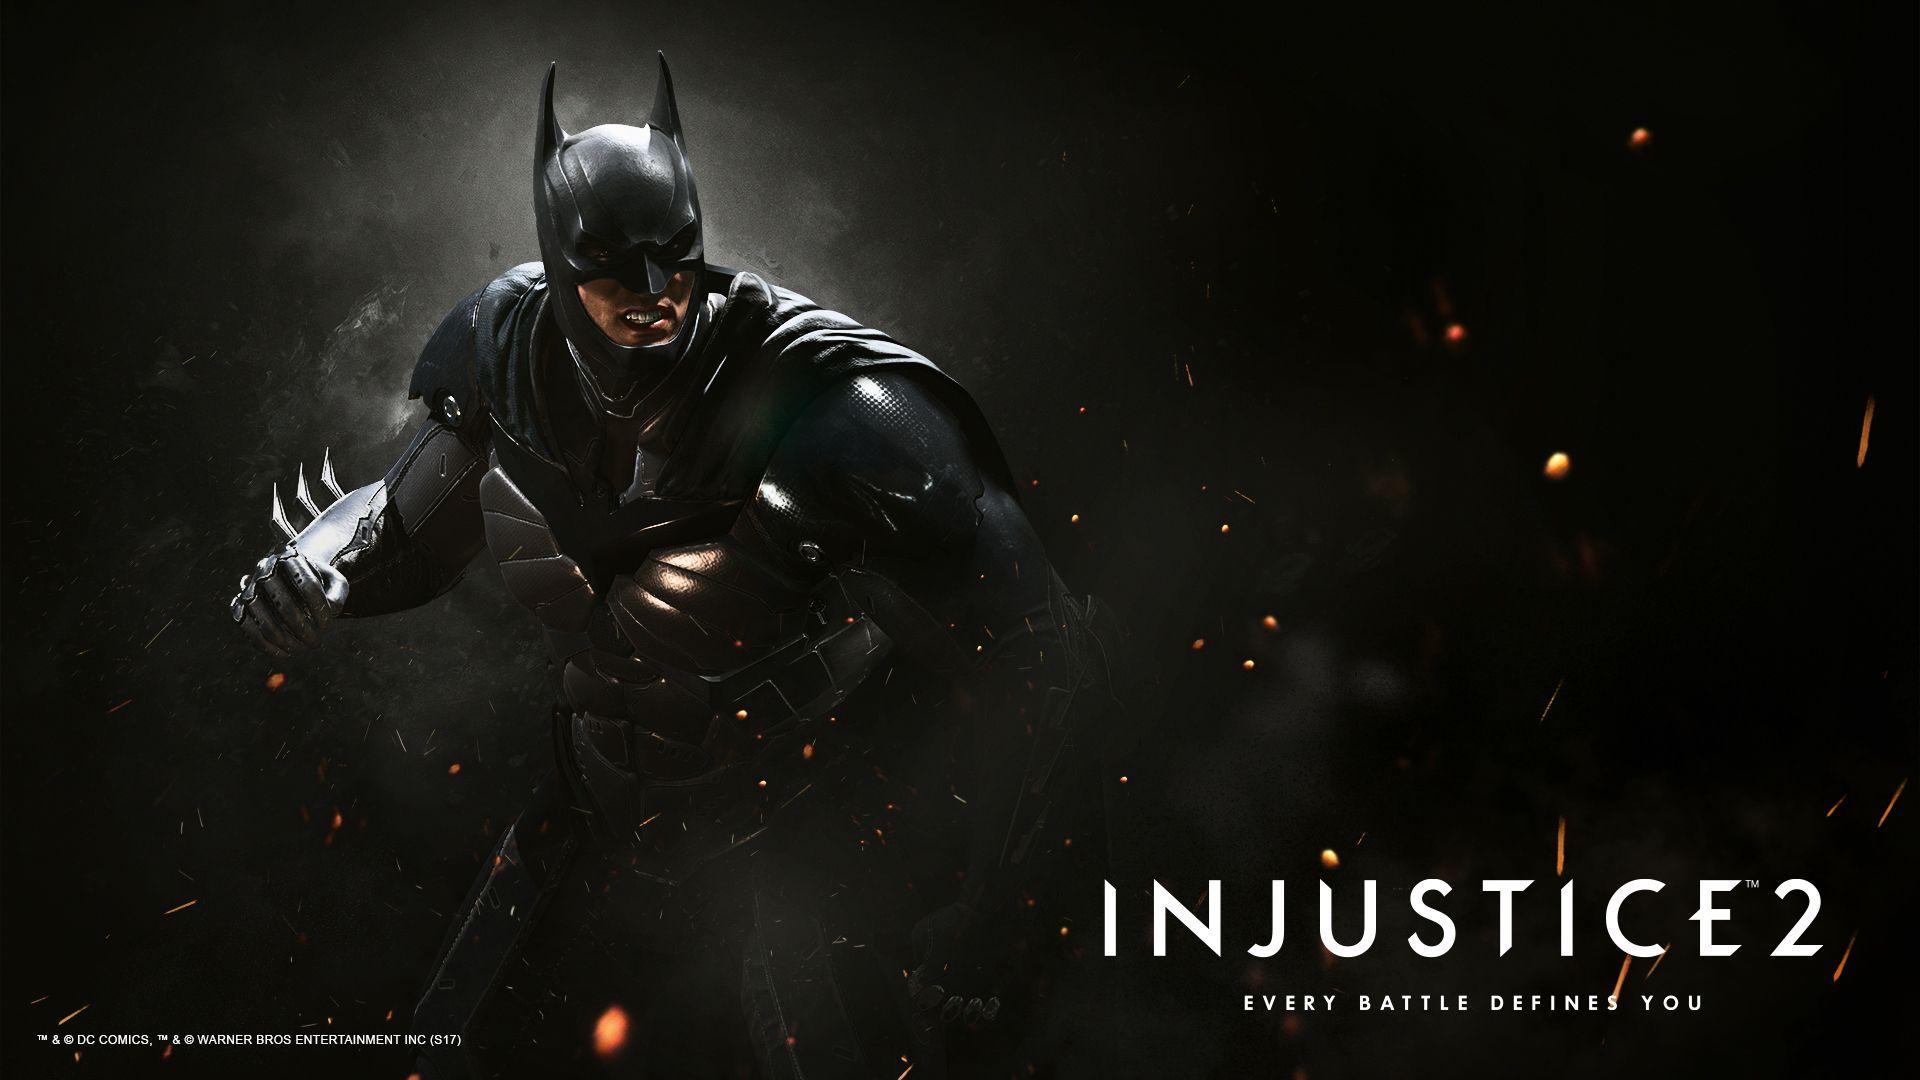 Review Injustice 2 Gamer SpoilerGamer Spoiler